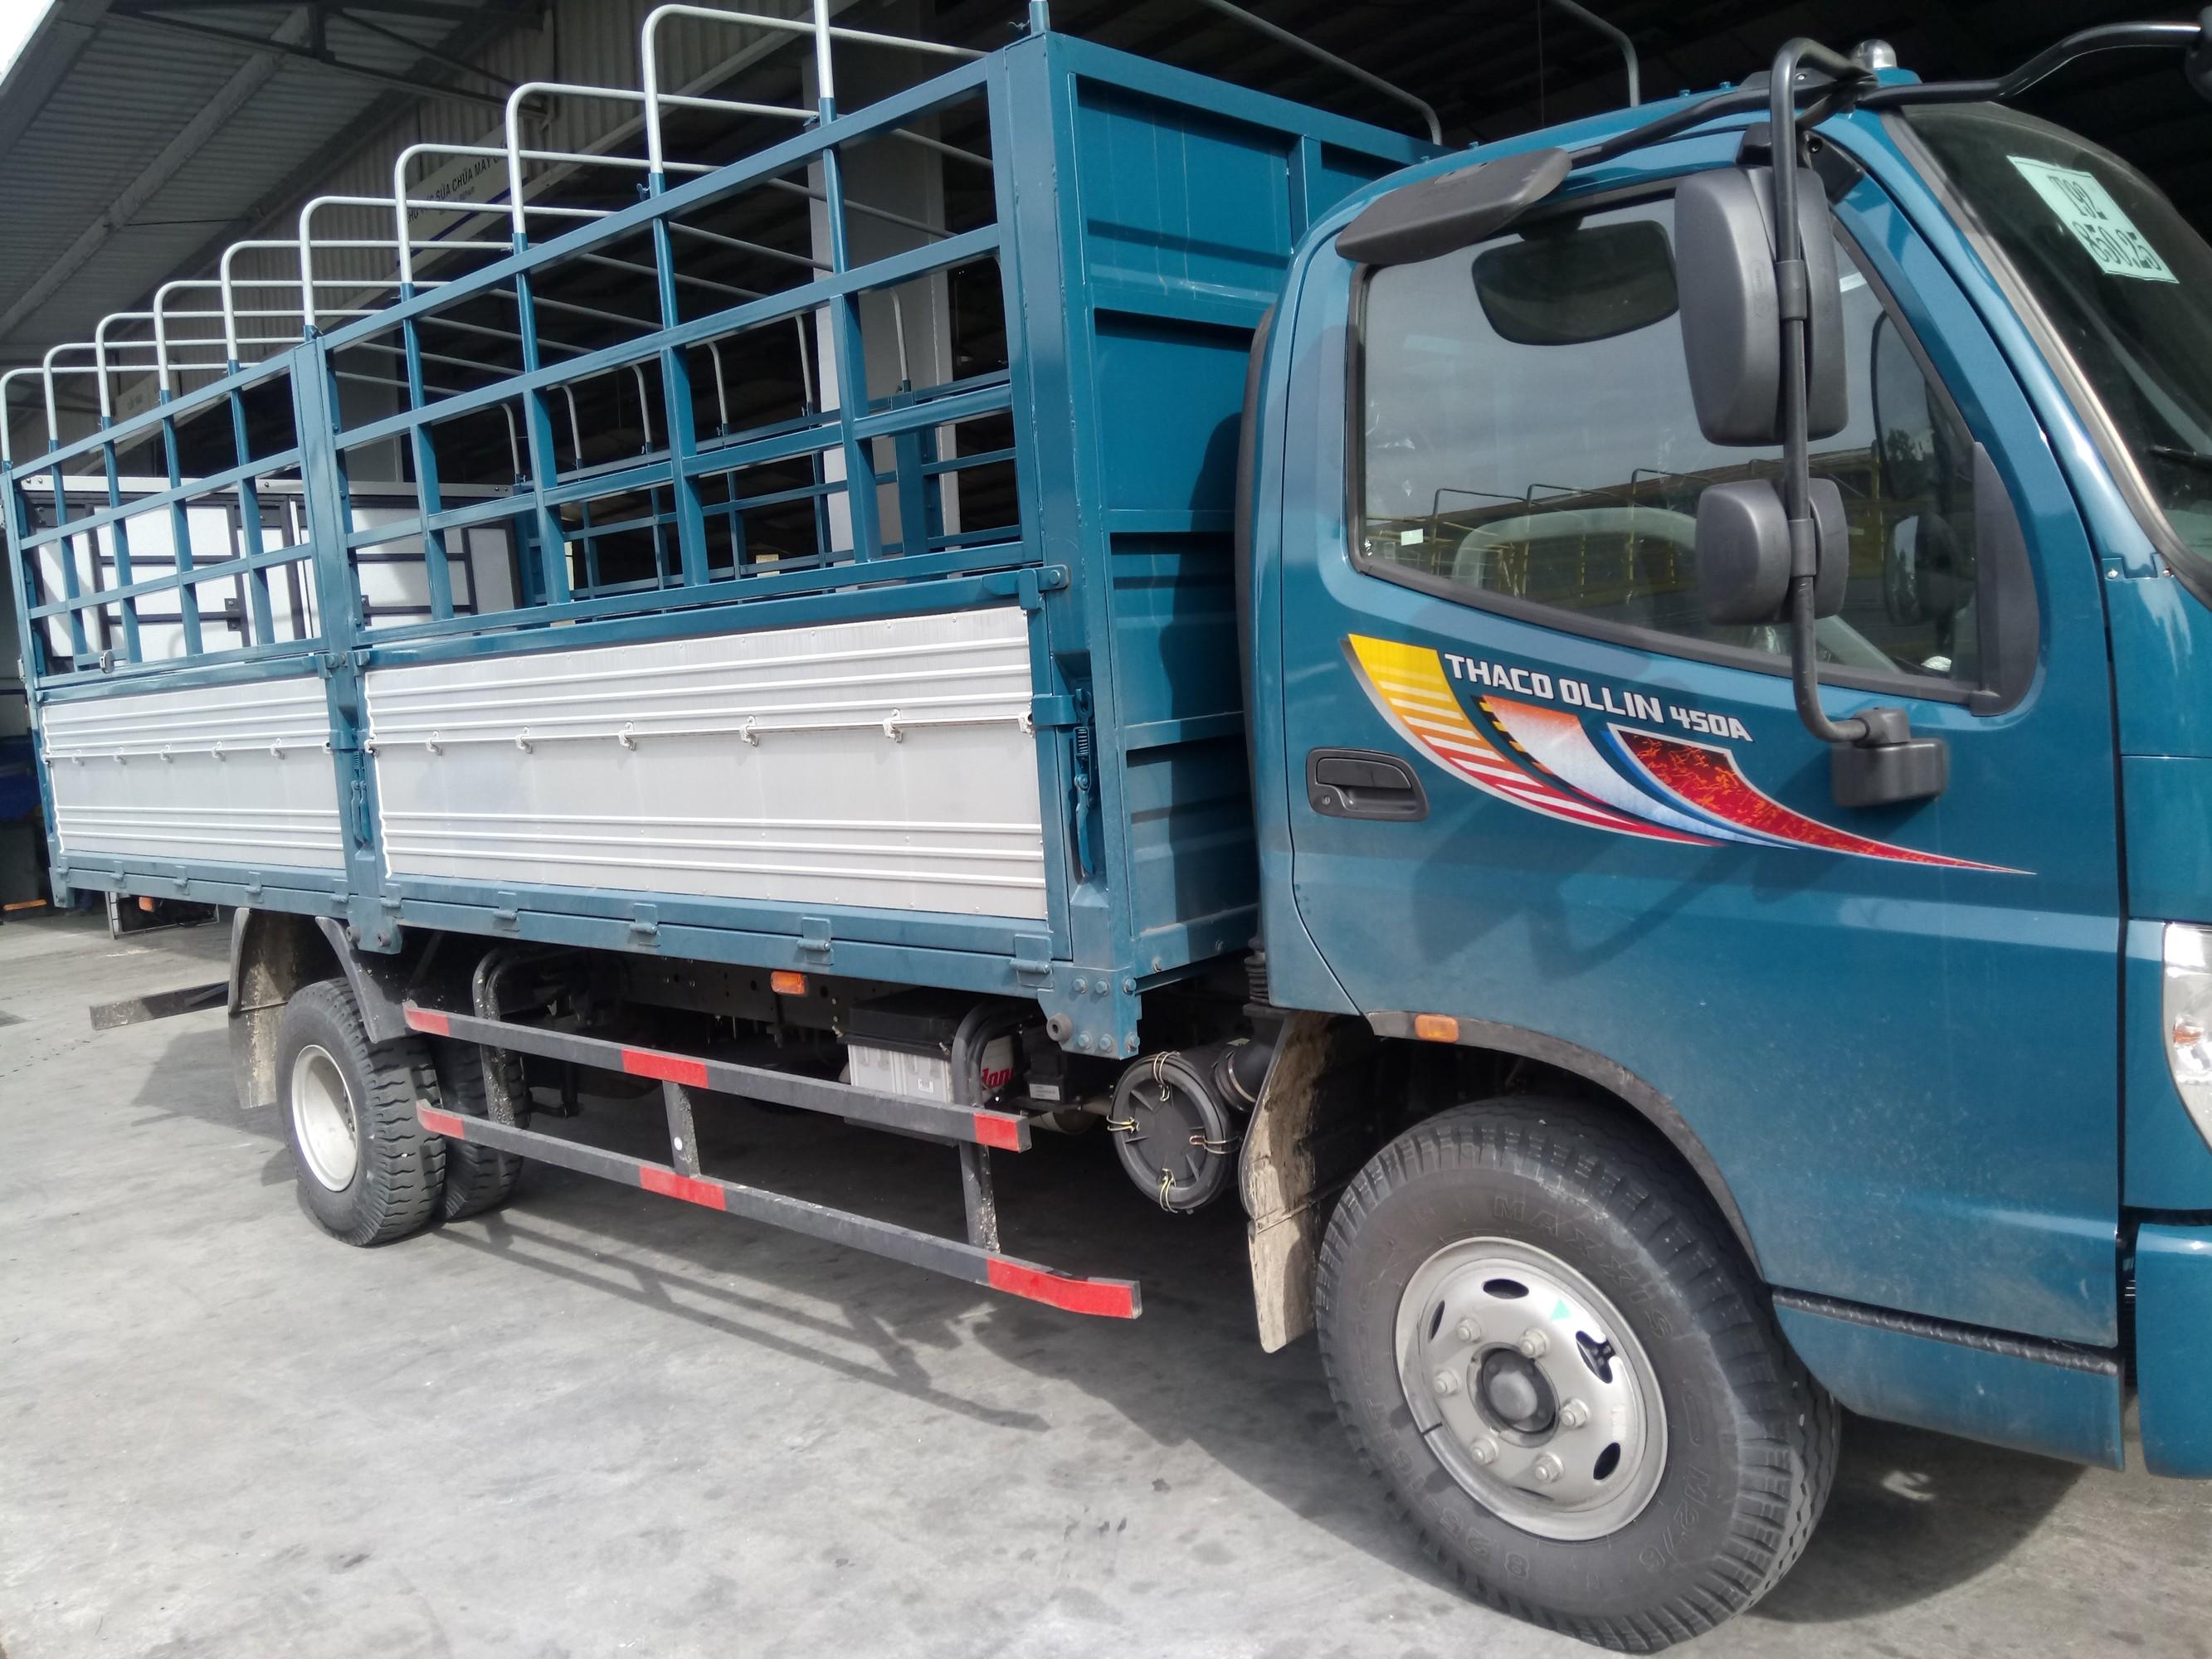 Xe tải thaco Ollin 5Tấn, xe tải ollin 700B 7 Tấn, xe tải thaco Ollin 5 tấn, xe tải OLLIN 700b 7 tấn Ảnh số 40374131